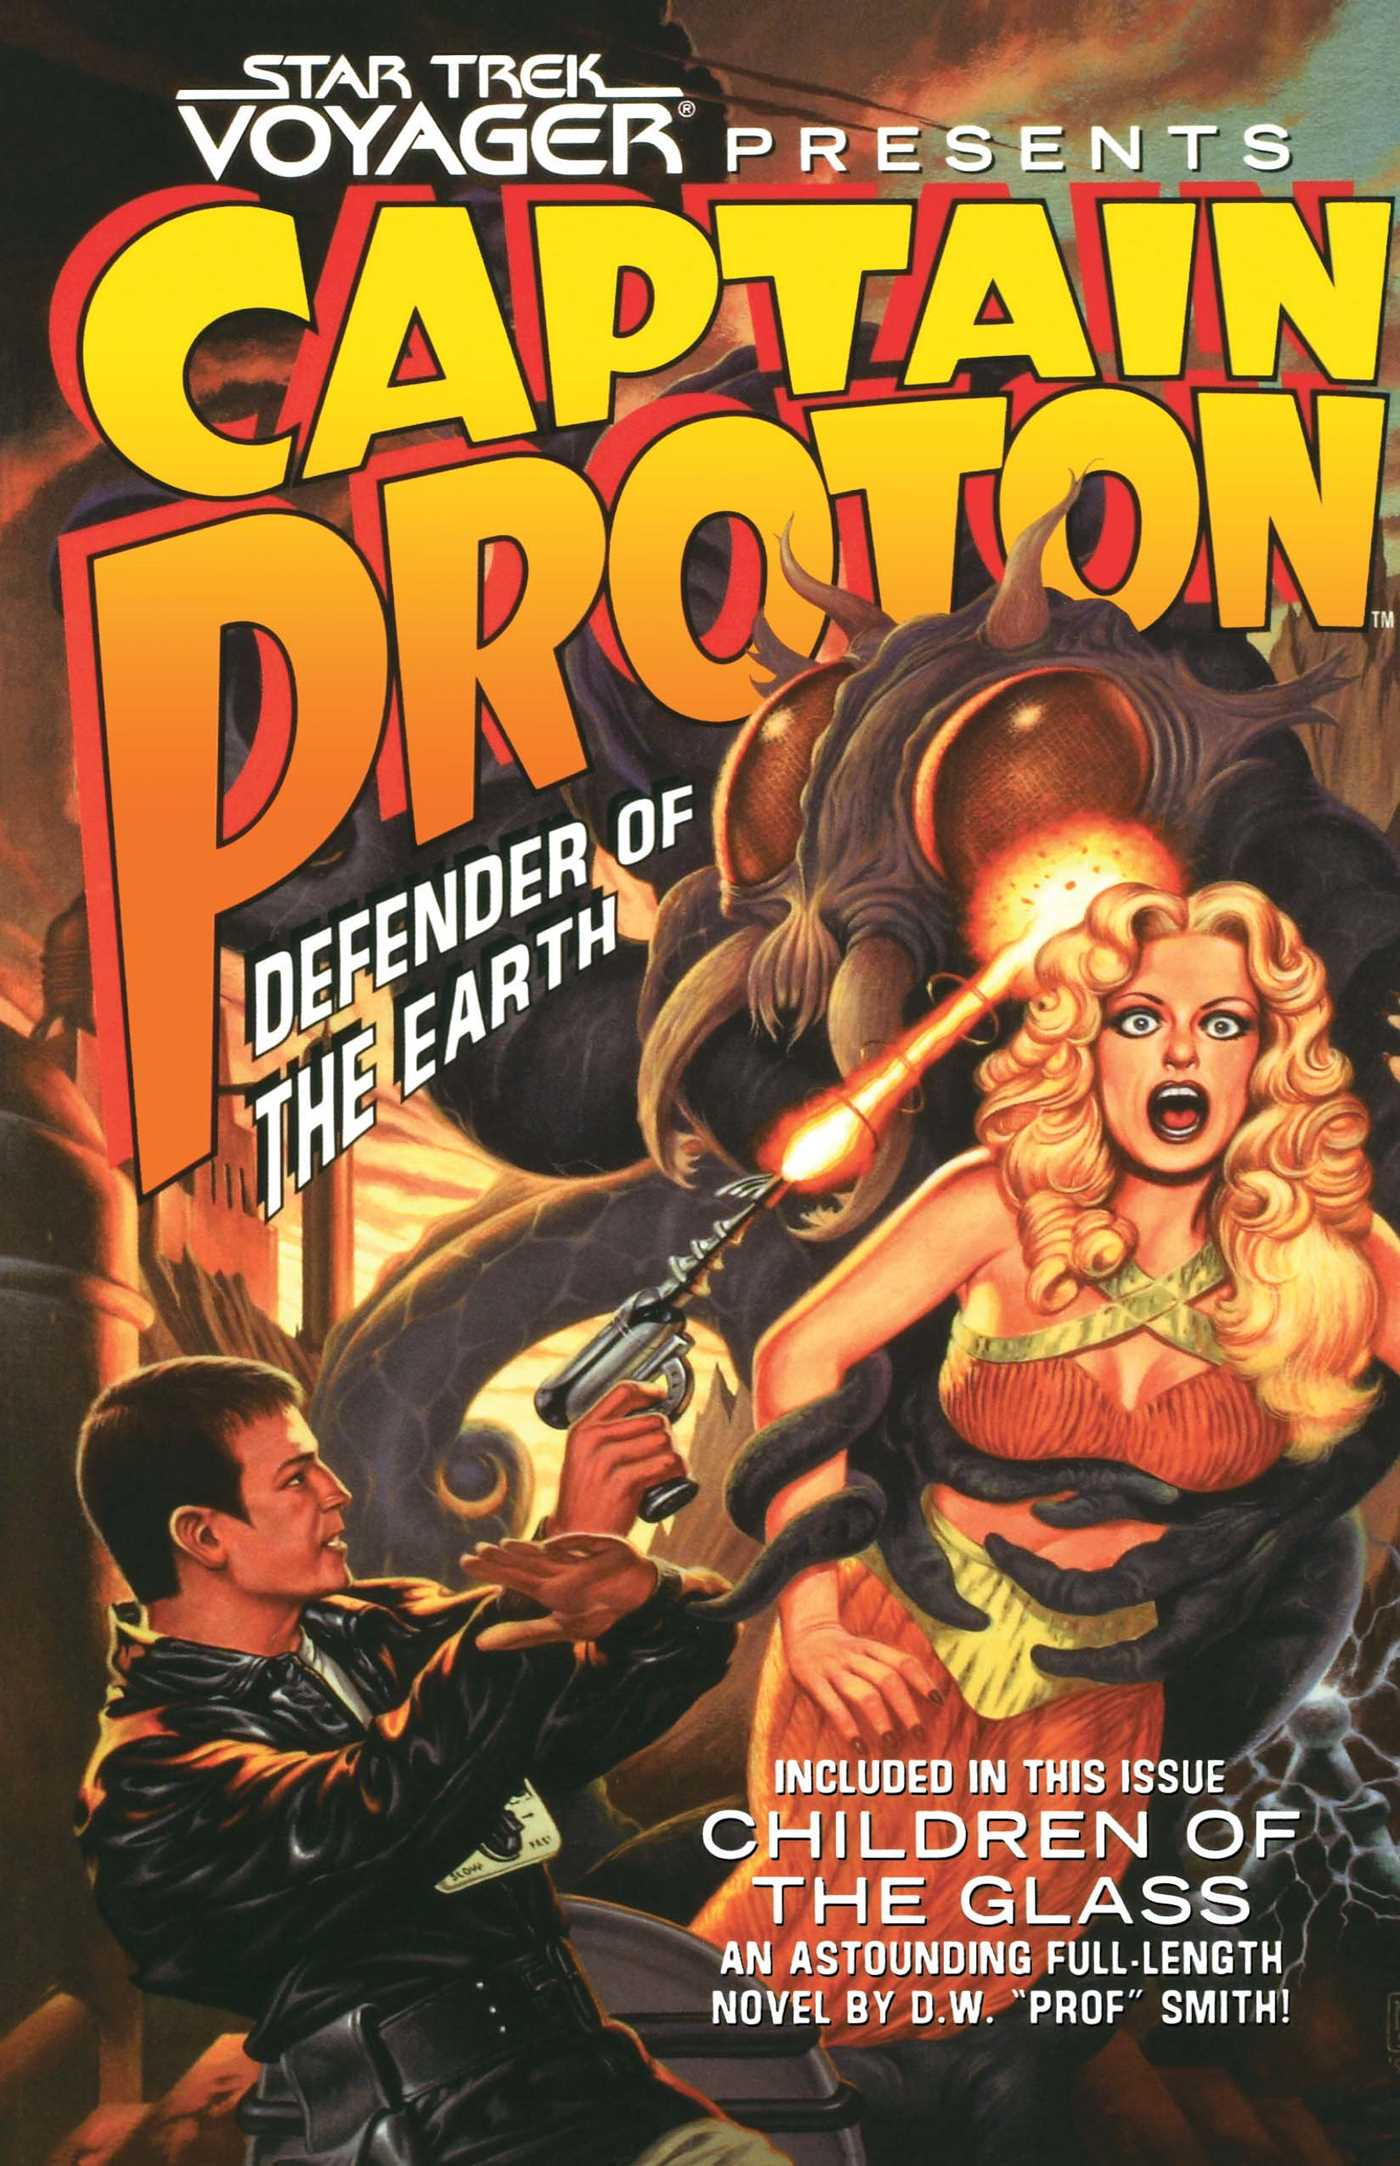 captain-proton-defender-of-the-earth.jpg